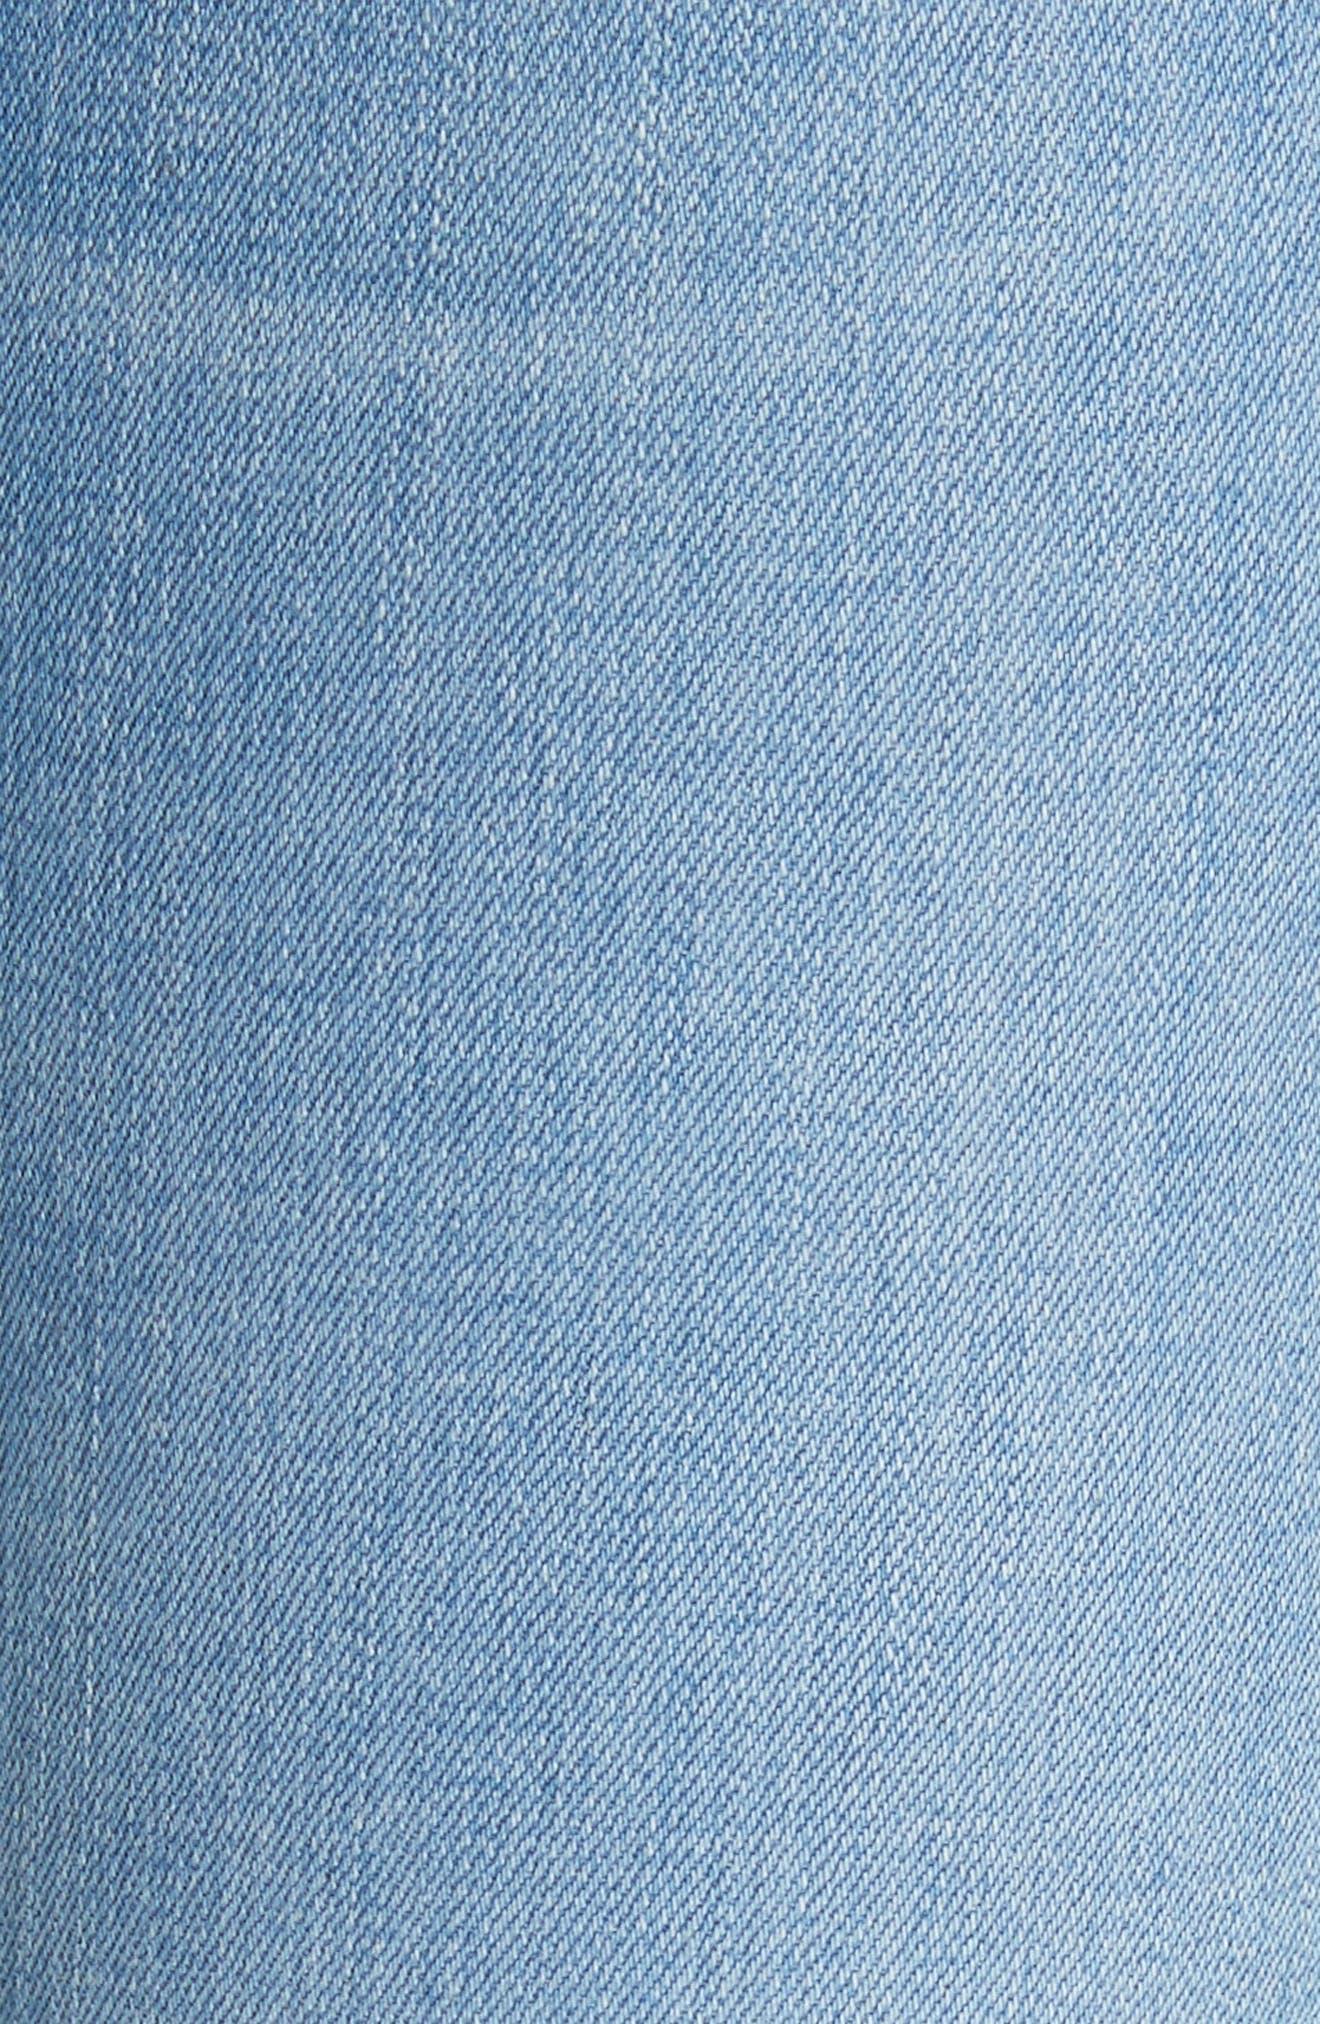 Carolyn Crop Baby Boot Jeans,                             Alternate thumbnail 5, color,                             Ocean Blue